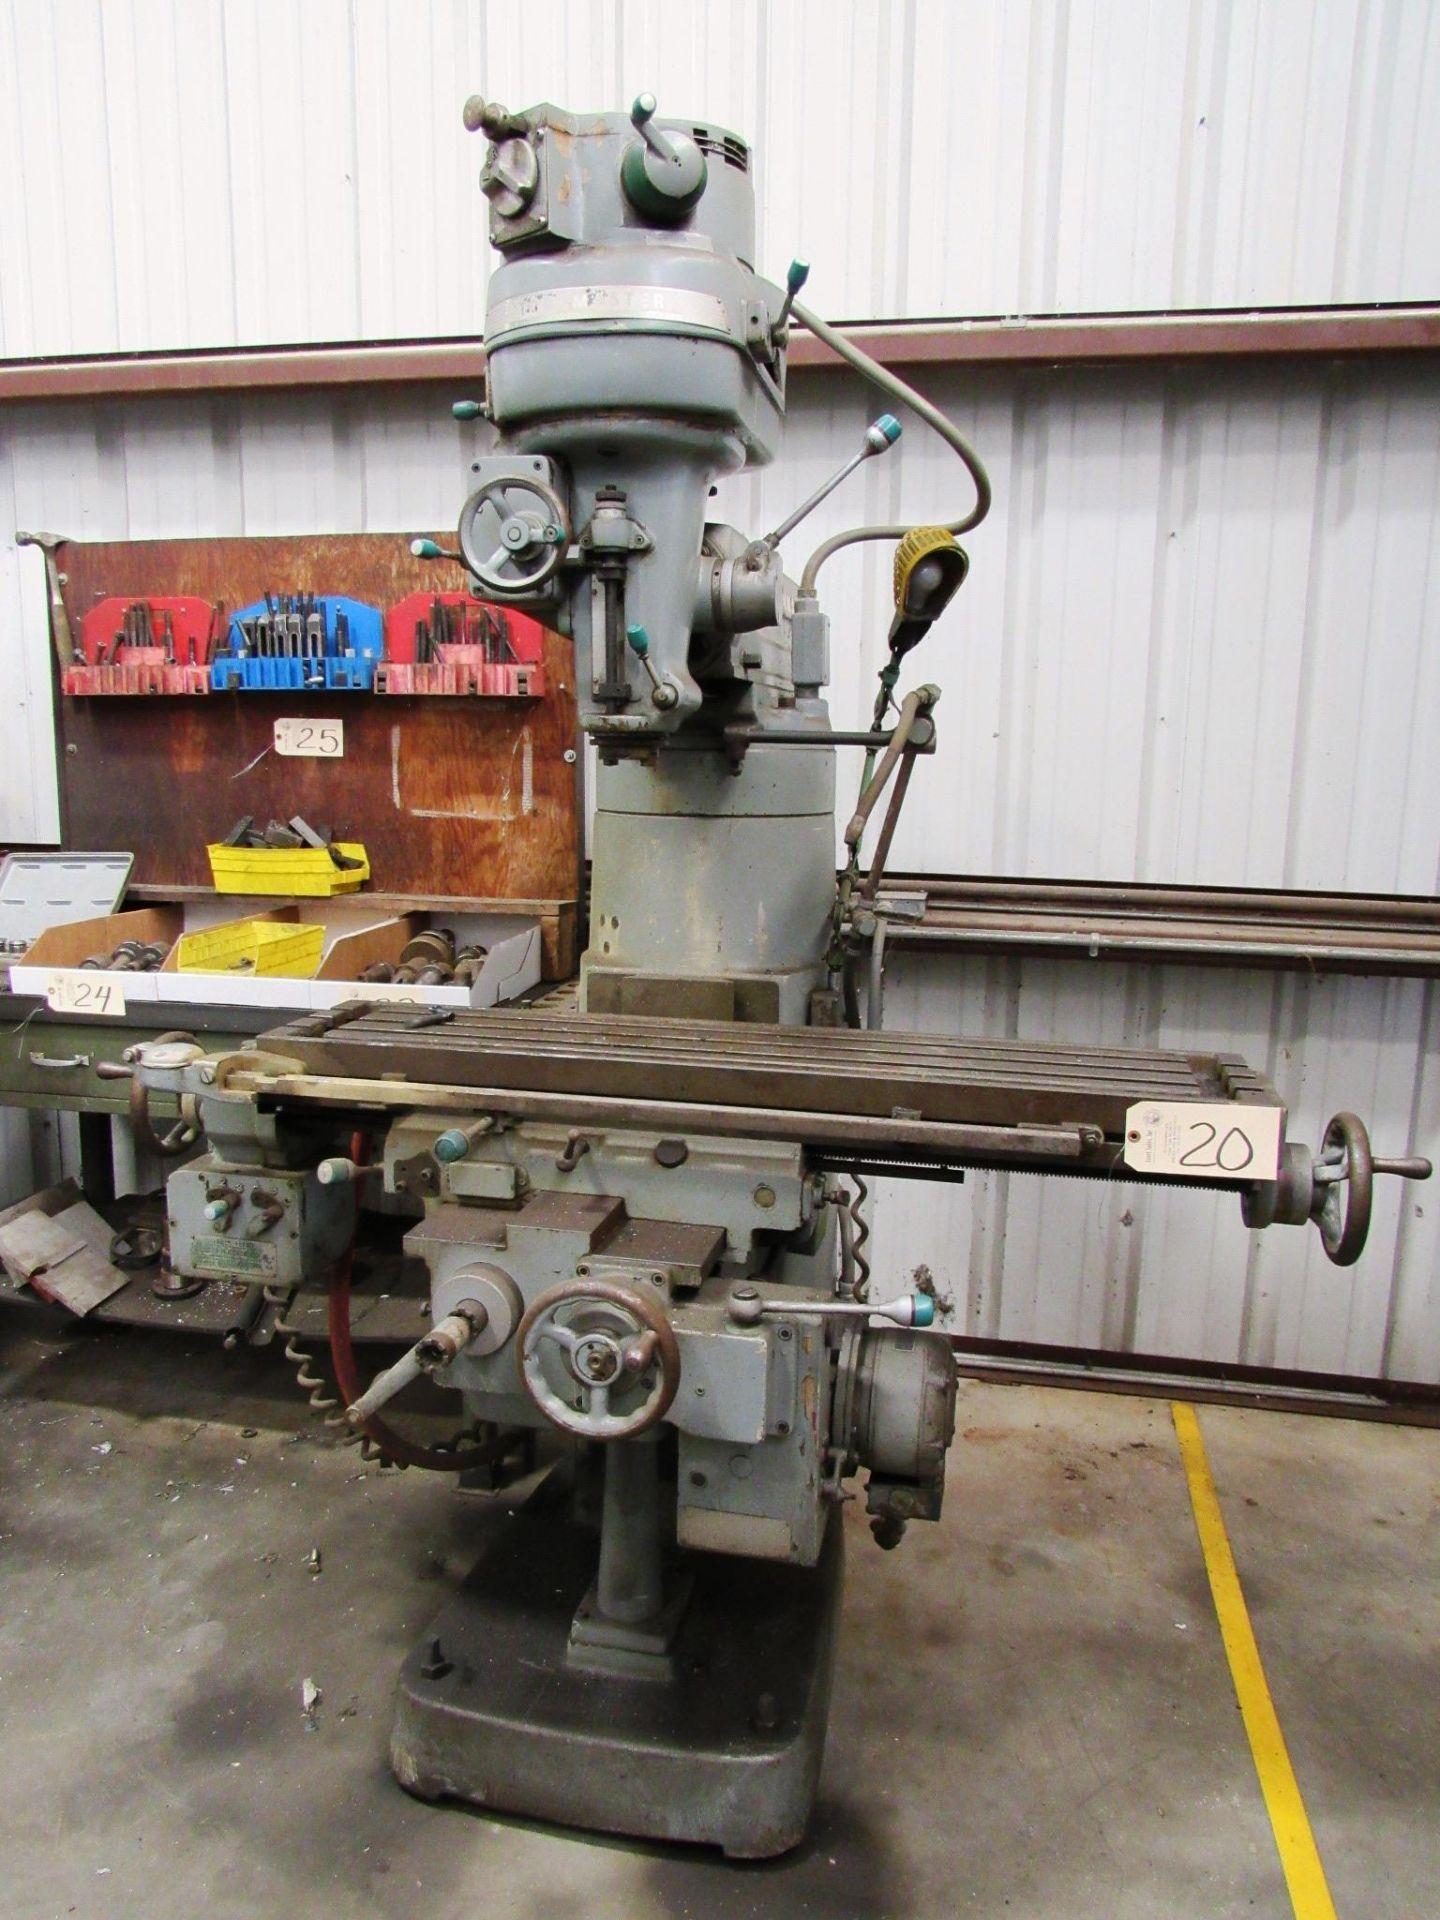 Lot 20 - Cincinnati Toolmaster Vertical Milling Machine